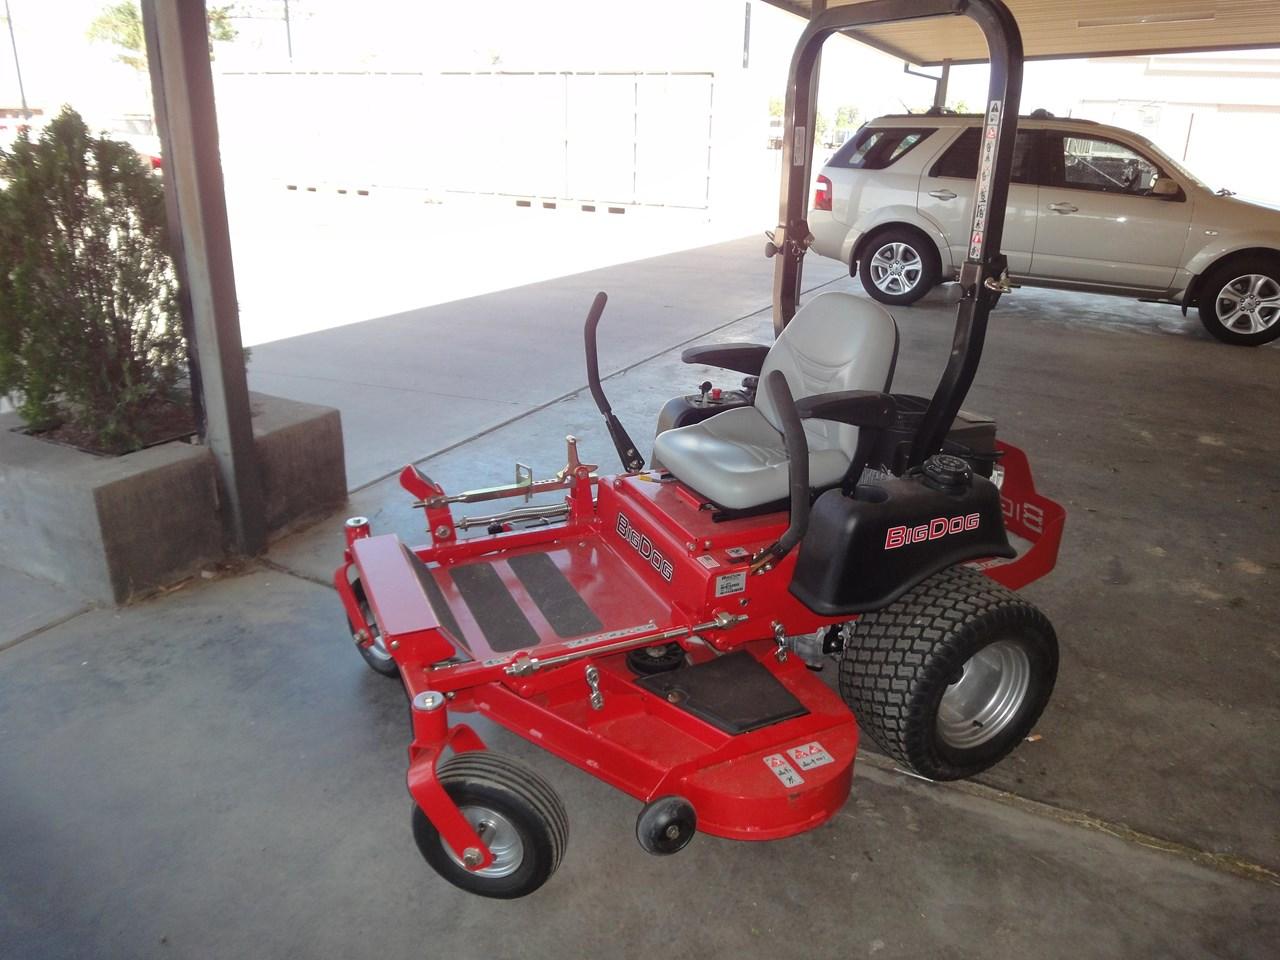 American Made Lawn Tractor - Rona Mantar